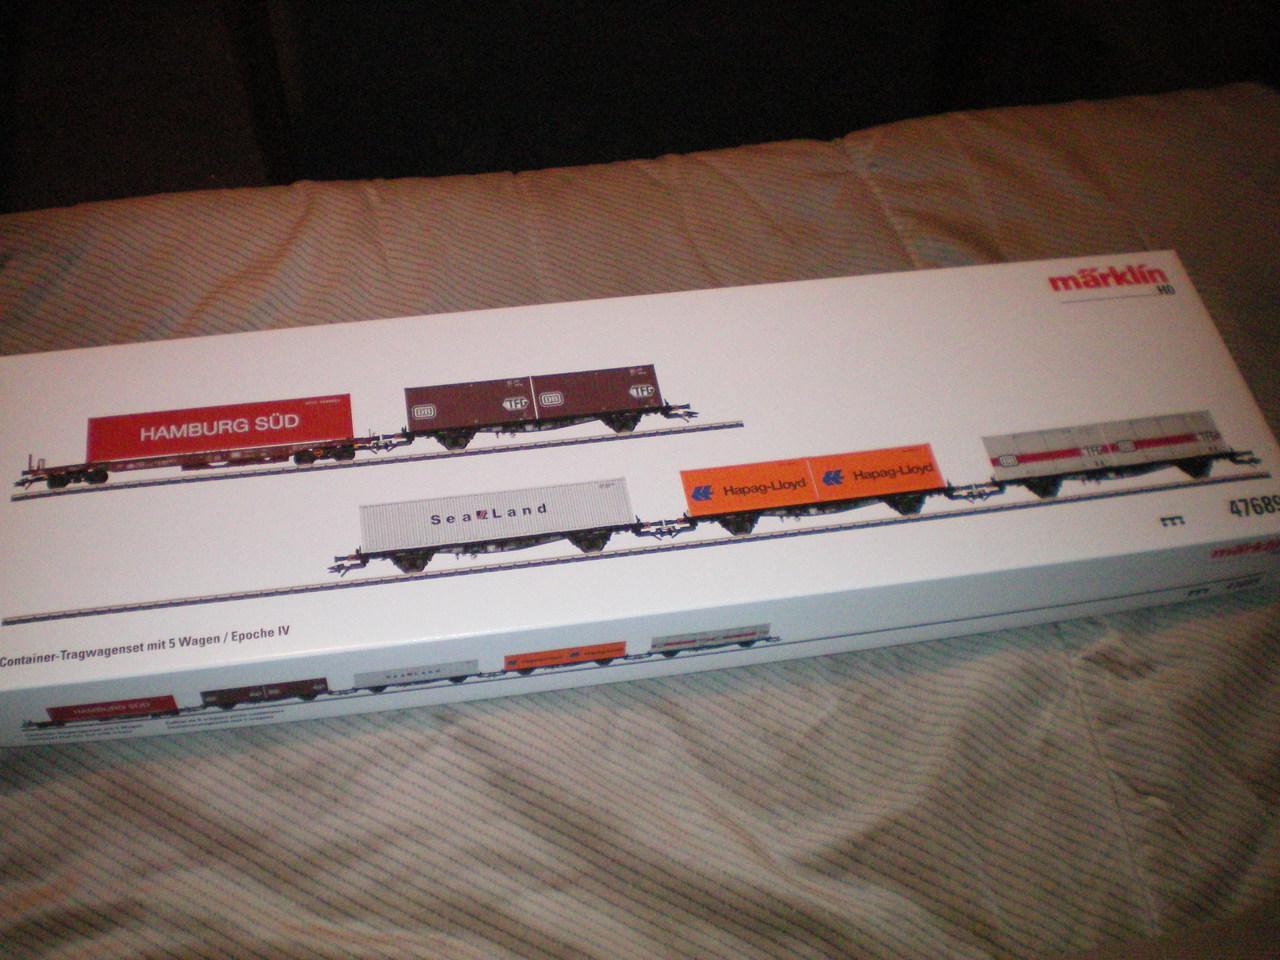 Container-Tragwagenset 47689 100_000692s2x